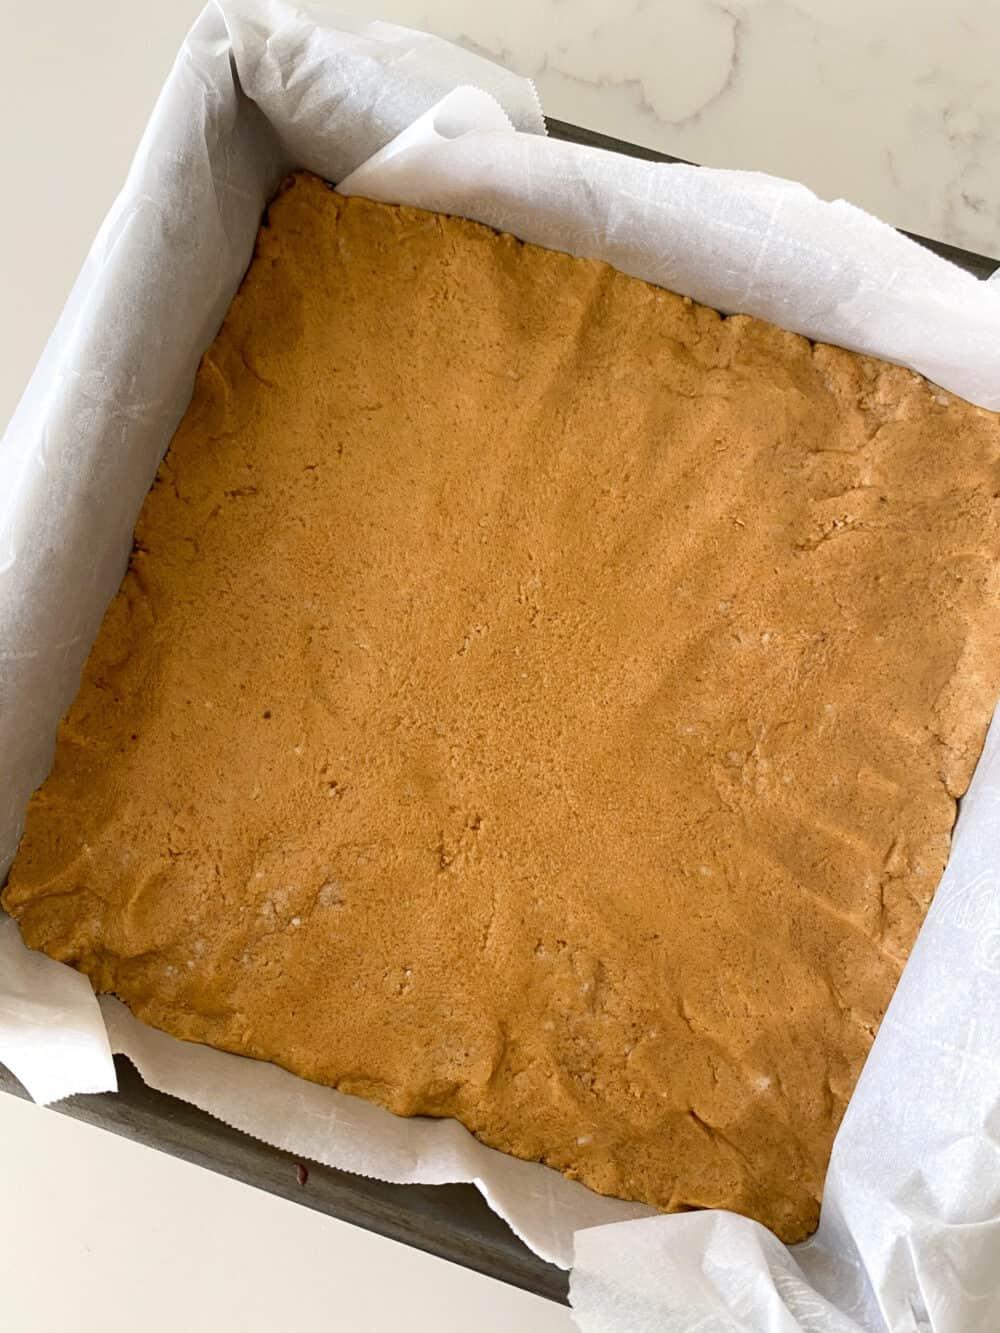 peanut butter bars dough pressed in pan